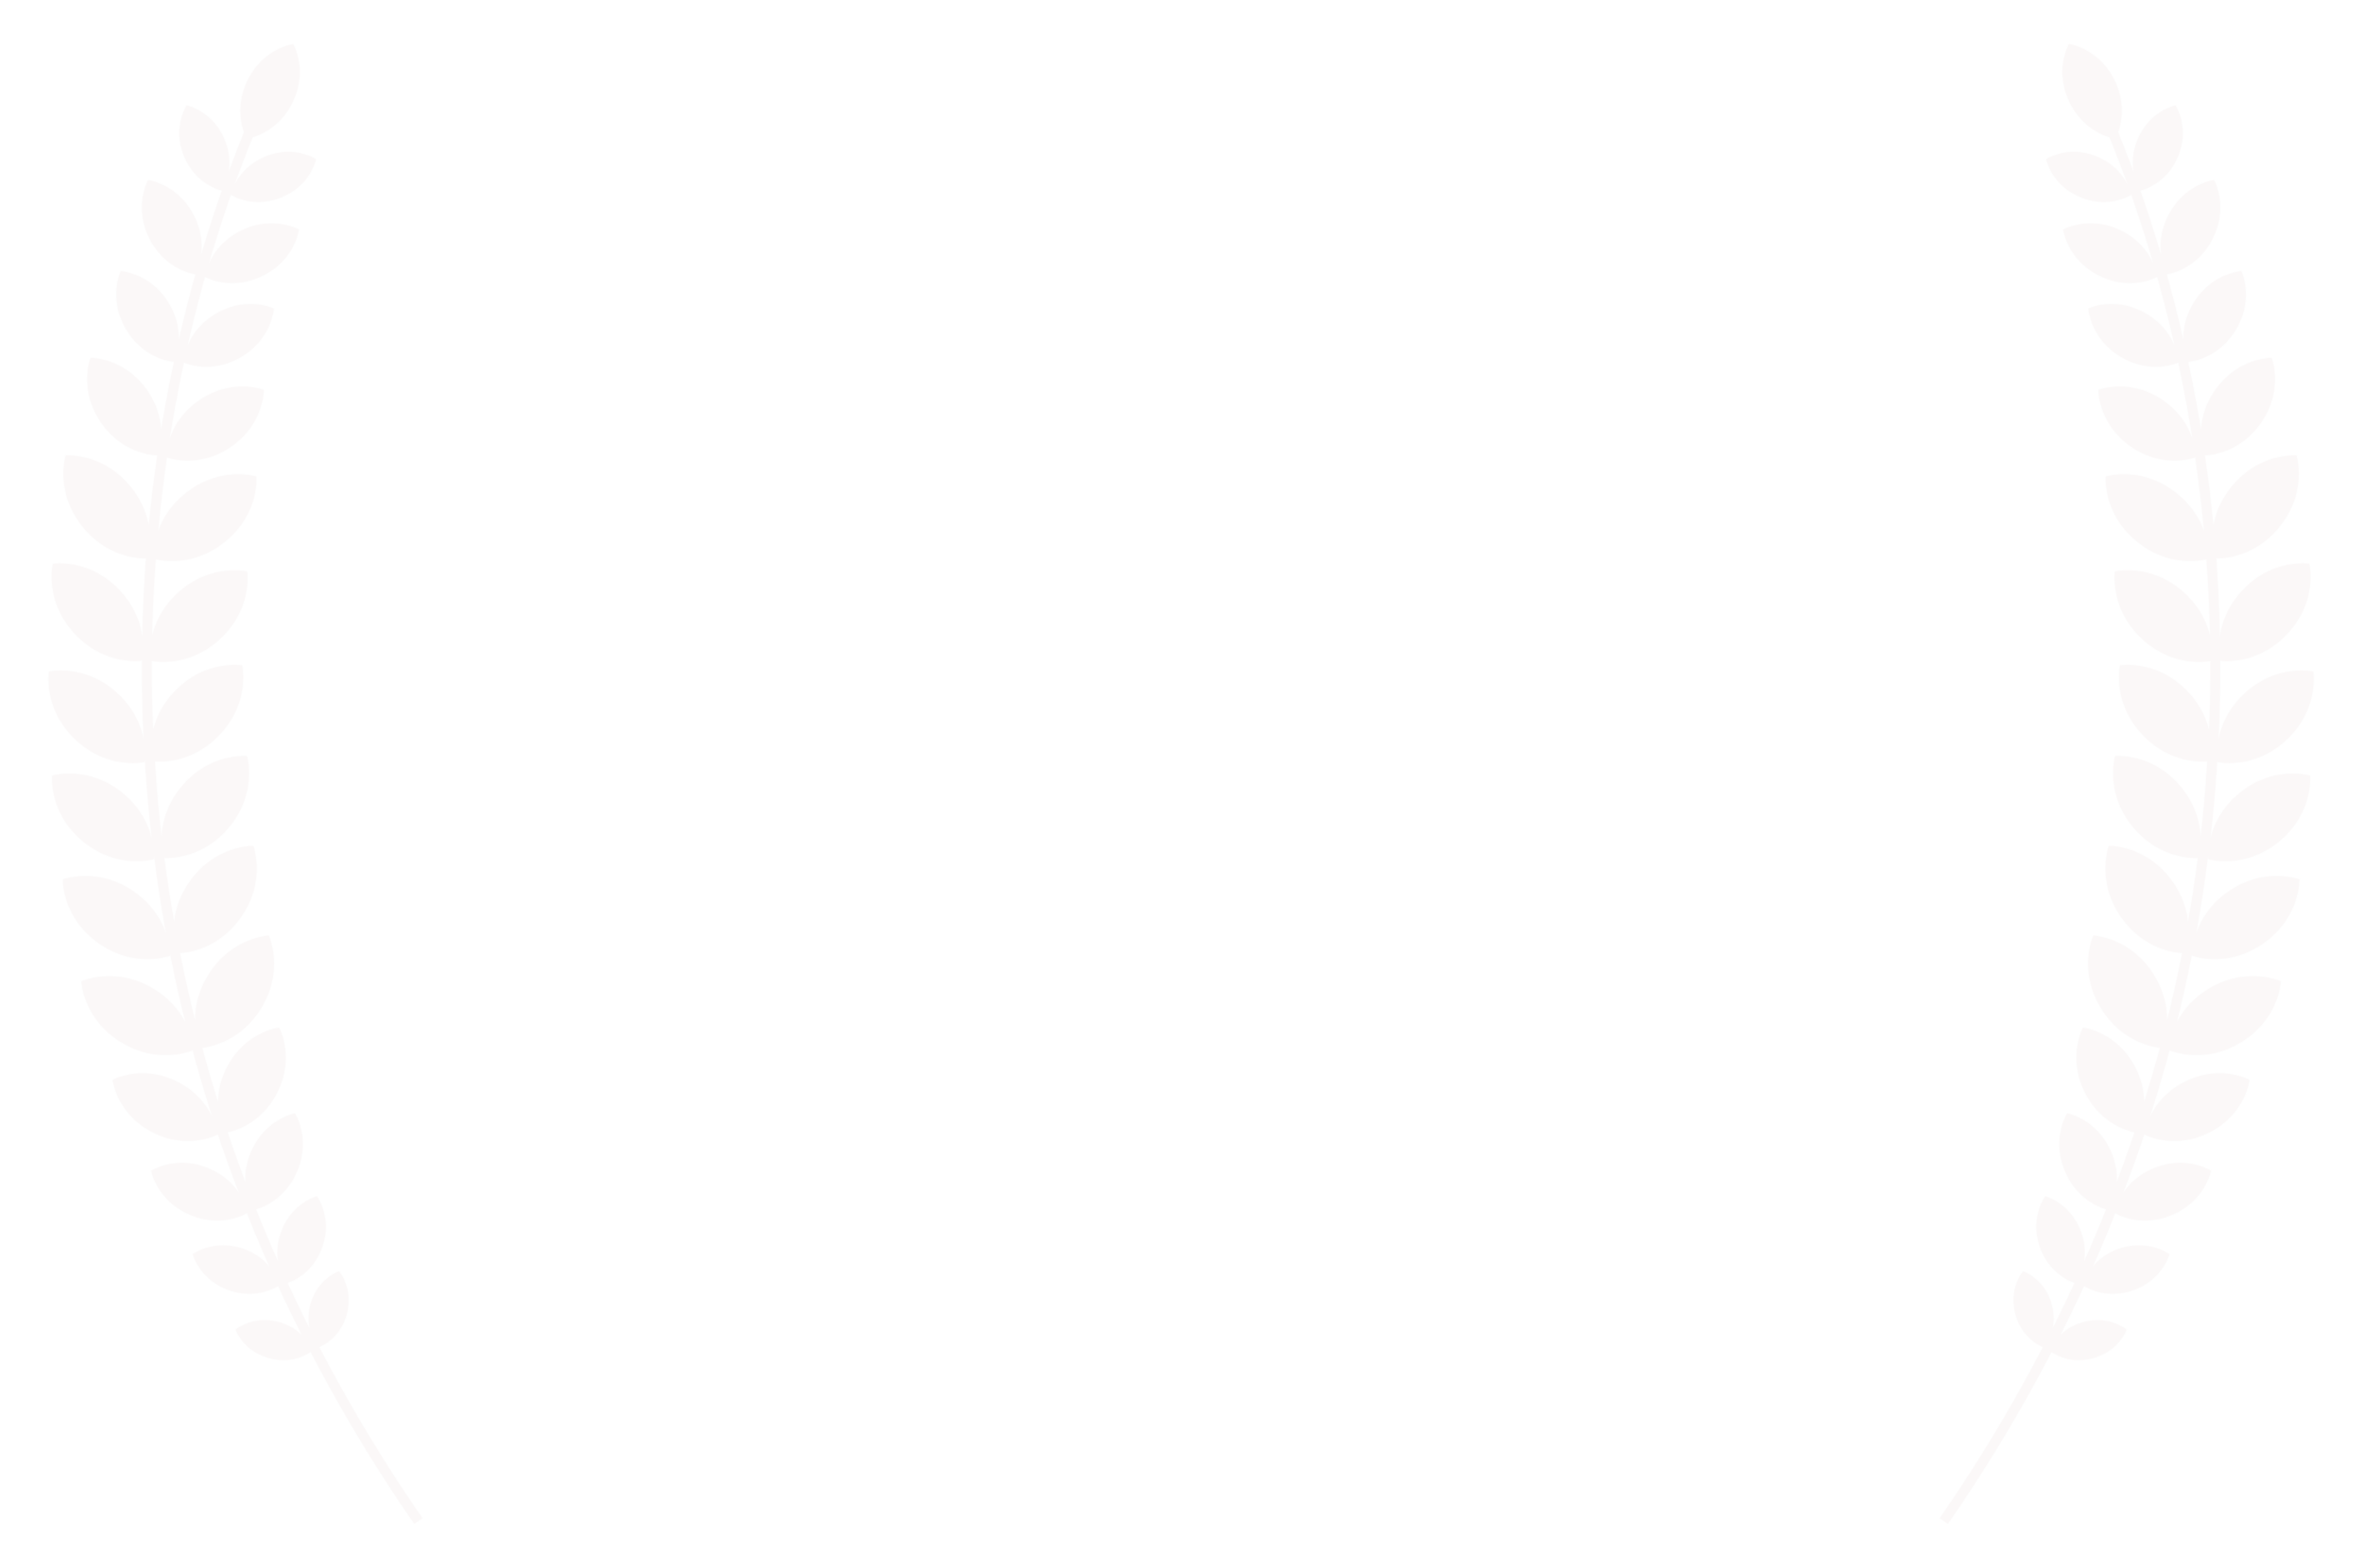 FINALIST-WildlifeVaasaFestival-InternationalNatureFilmFestival-2016 copy.png